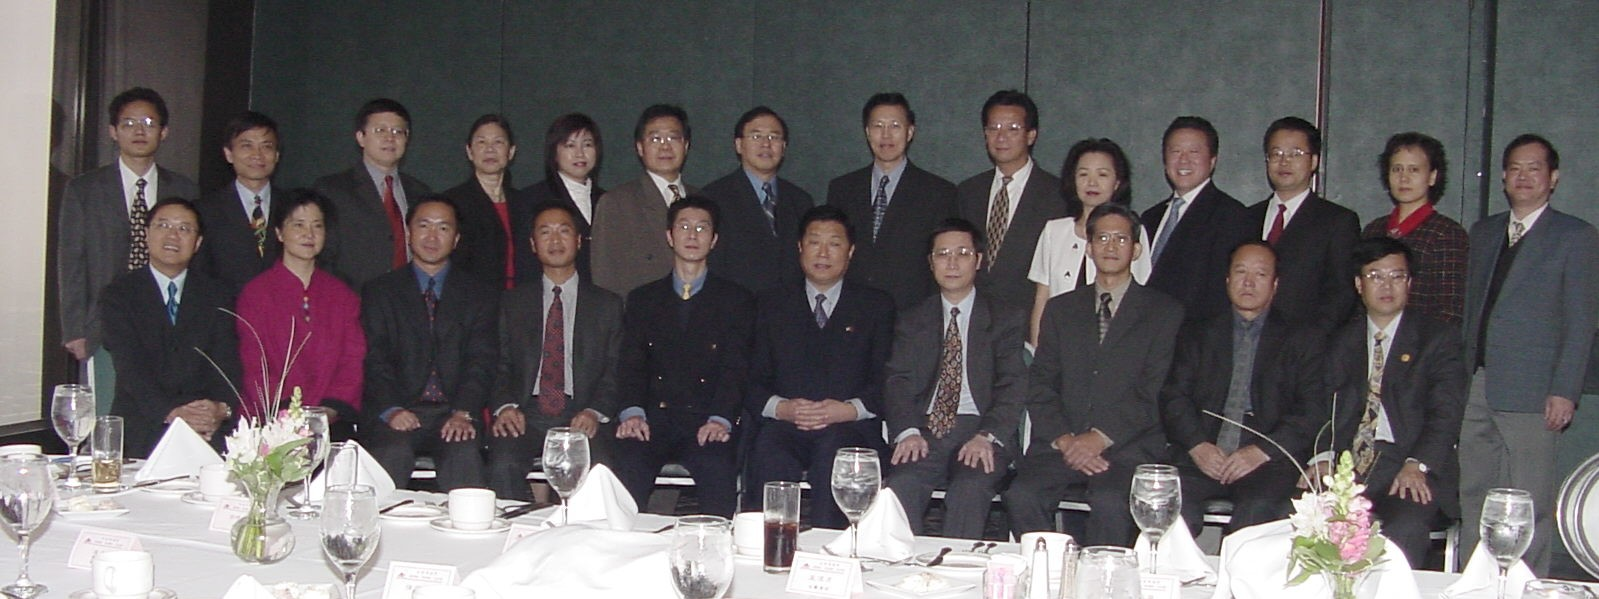 2003 Oversea Visit (6).JPG